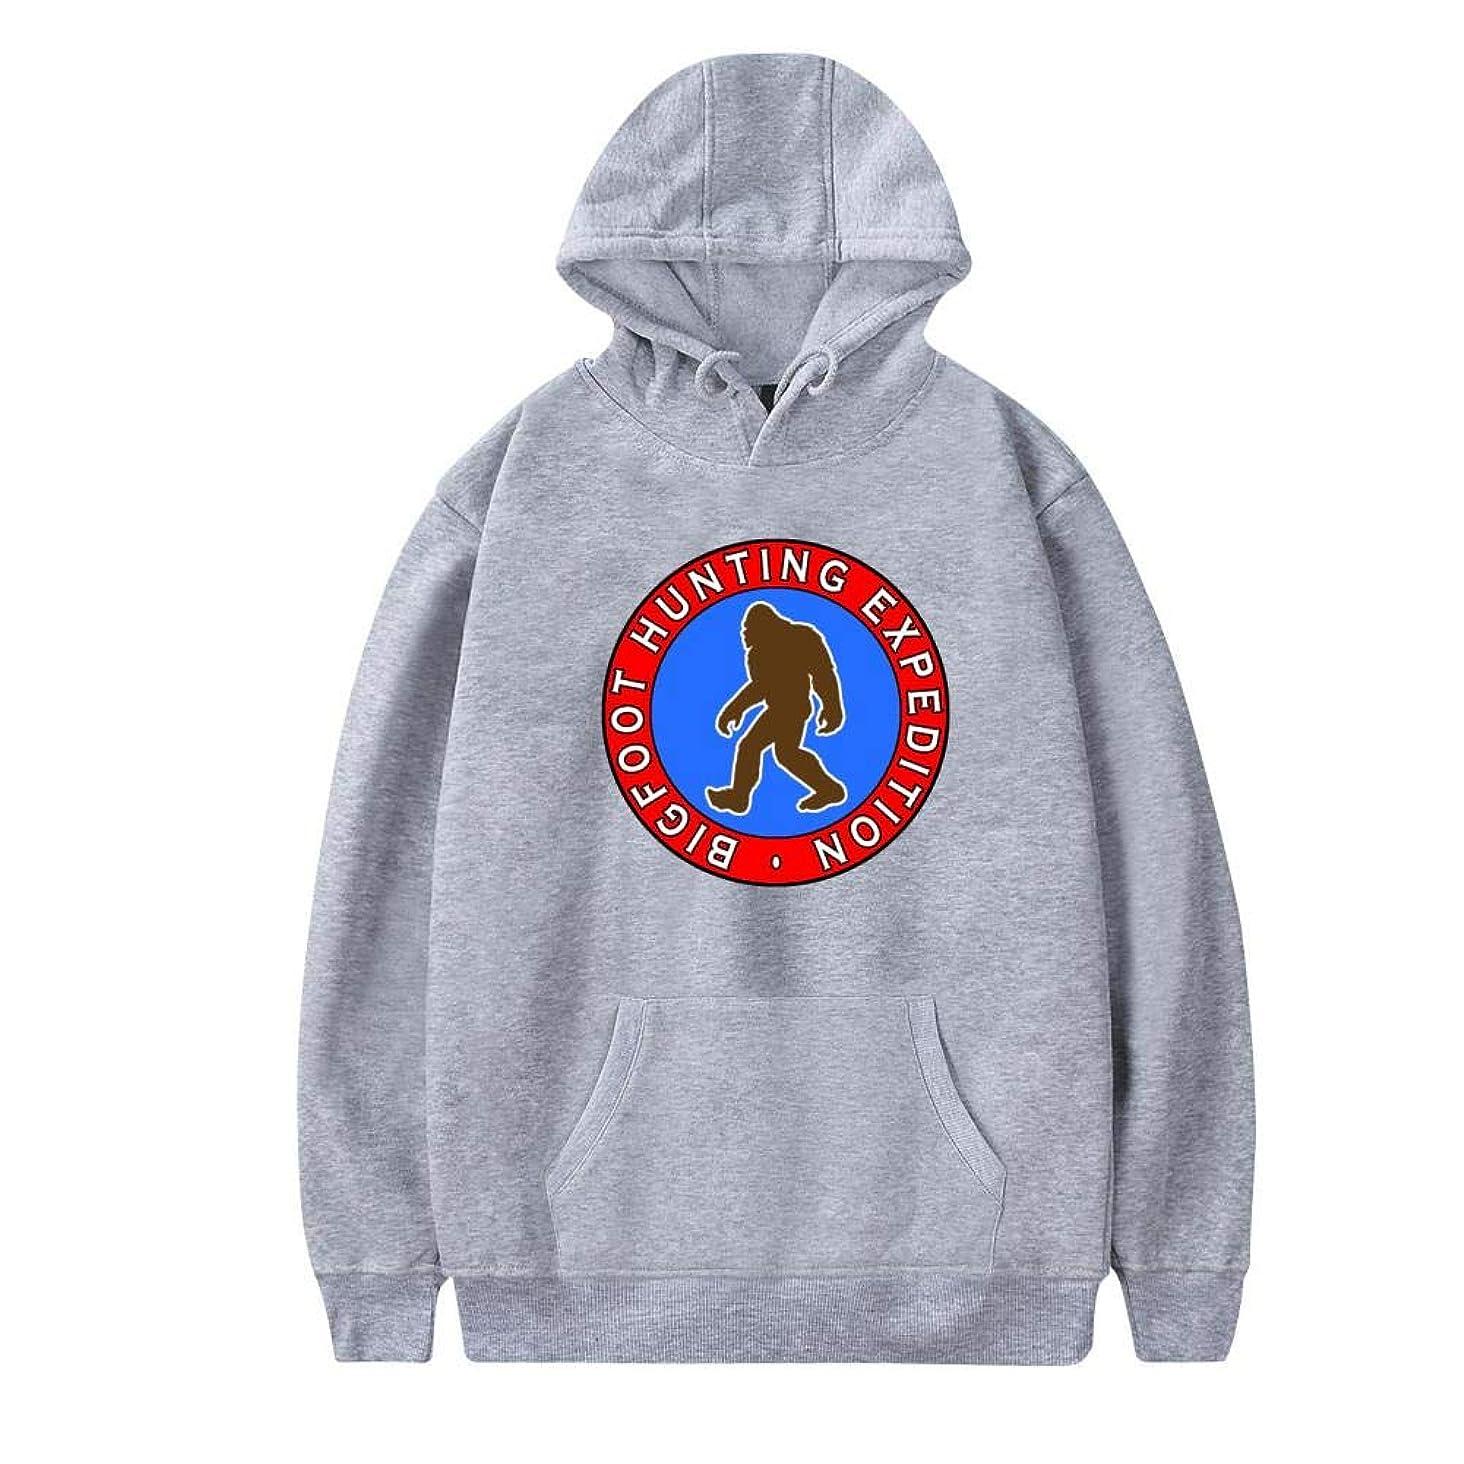 Aslgisy Mens Funny Hooded,Fashion Bigf-oot Hunting Expedition Printed Velvet Pocket Hipster Hip Hop Hoodies